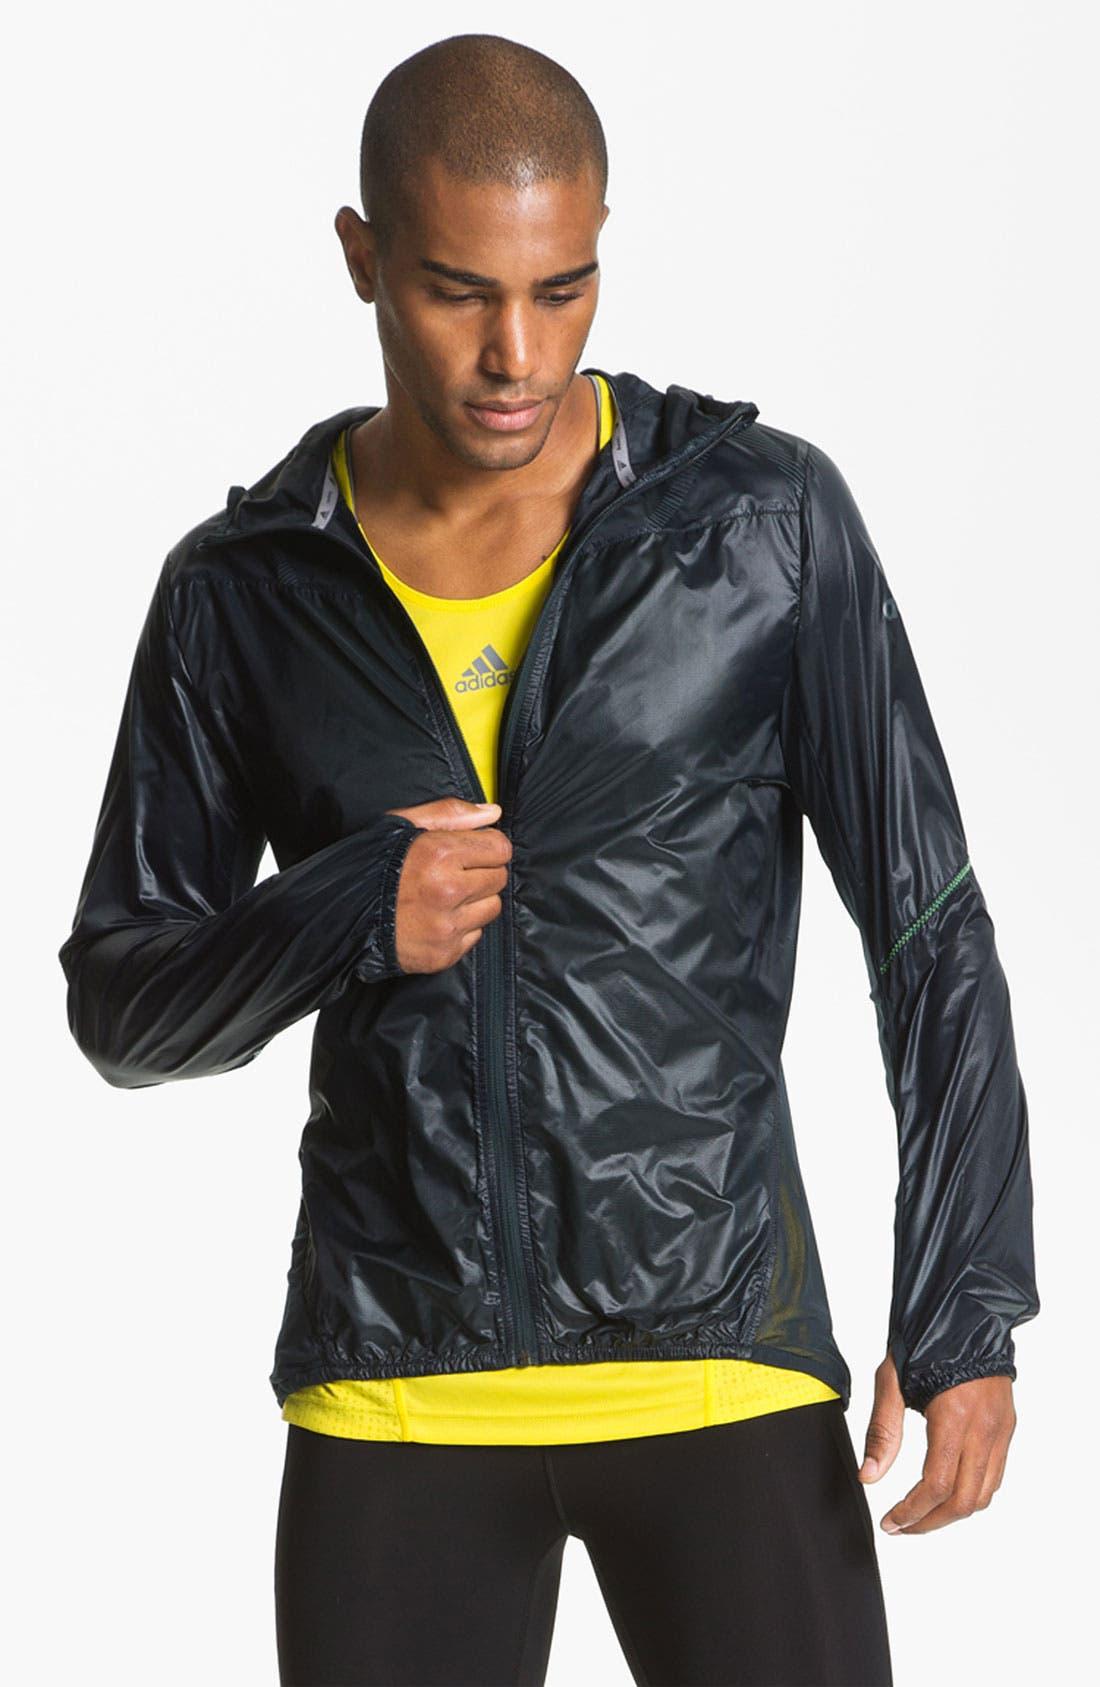 Alternate Image 1 Selected - adidas 'Fast Roadrunner' Jacket